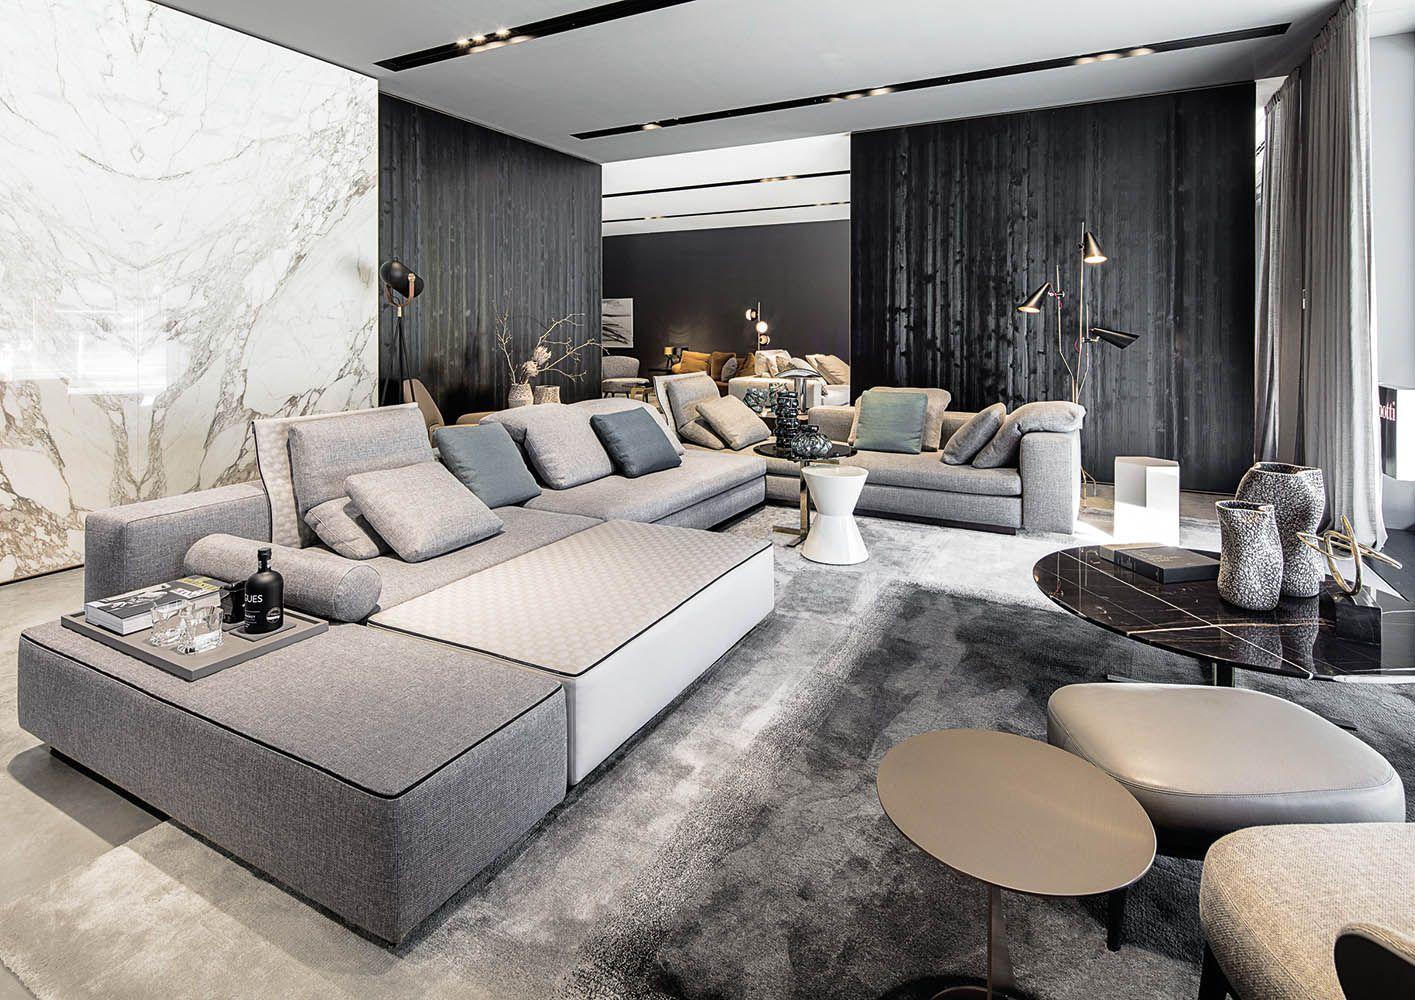 Munchen Flagship Store Minotti Munchen Flagship Store Interior Design Living Room Interior Design Spacious Living Room